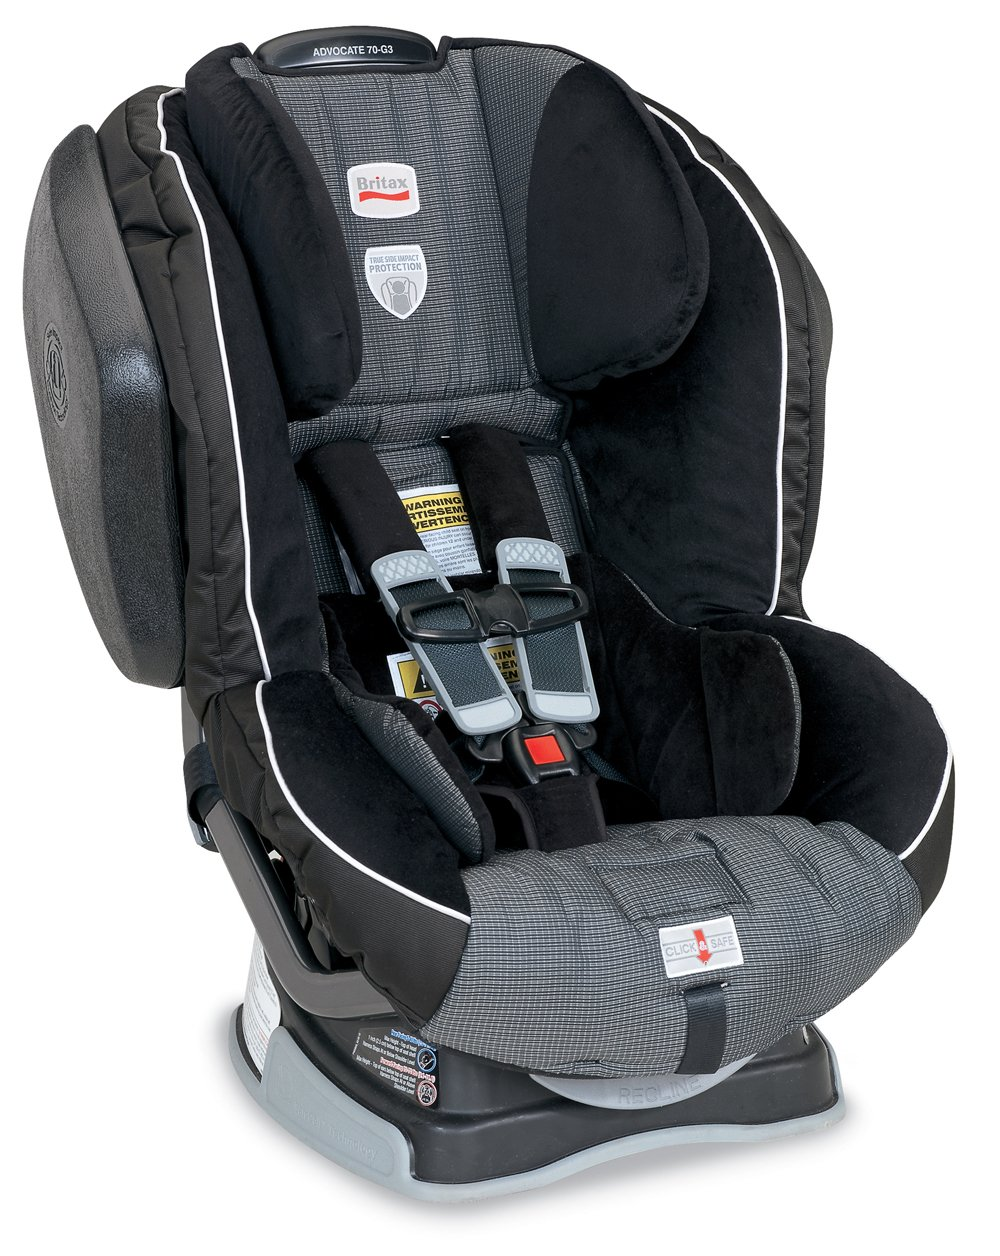 Amazon.com: Britax Advocate 70-G3 Convertible Car Seat, Onyx (Prior Model):  Baby